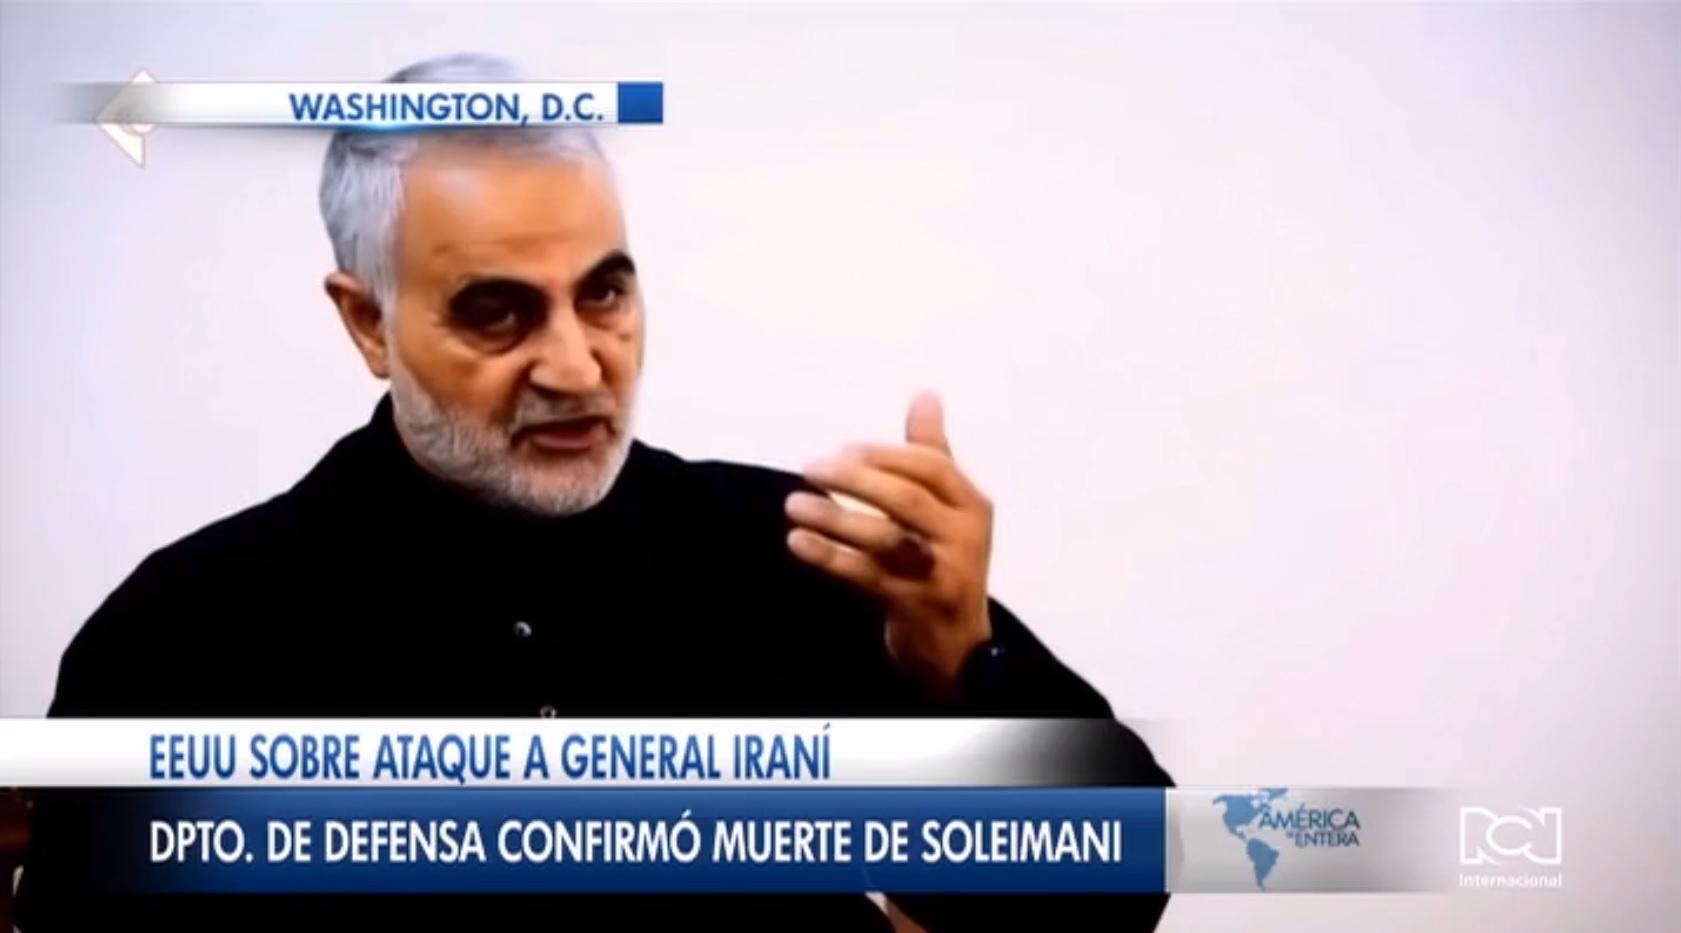 Estados Unidos confirmó la muerte del comandante de la Guardia Revolucionaria de Irán Qasem Soleimani